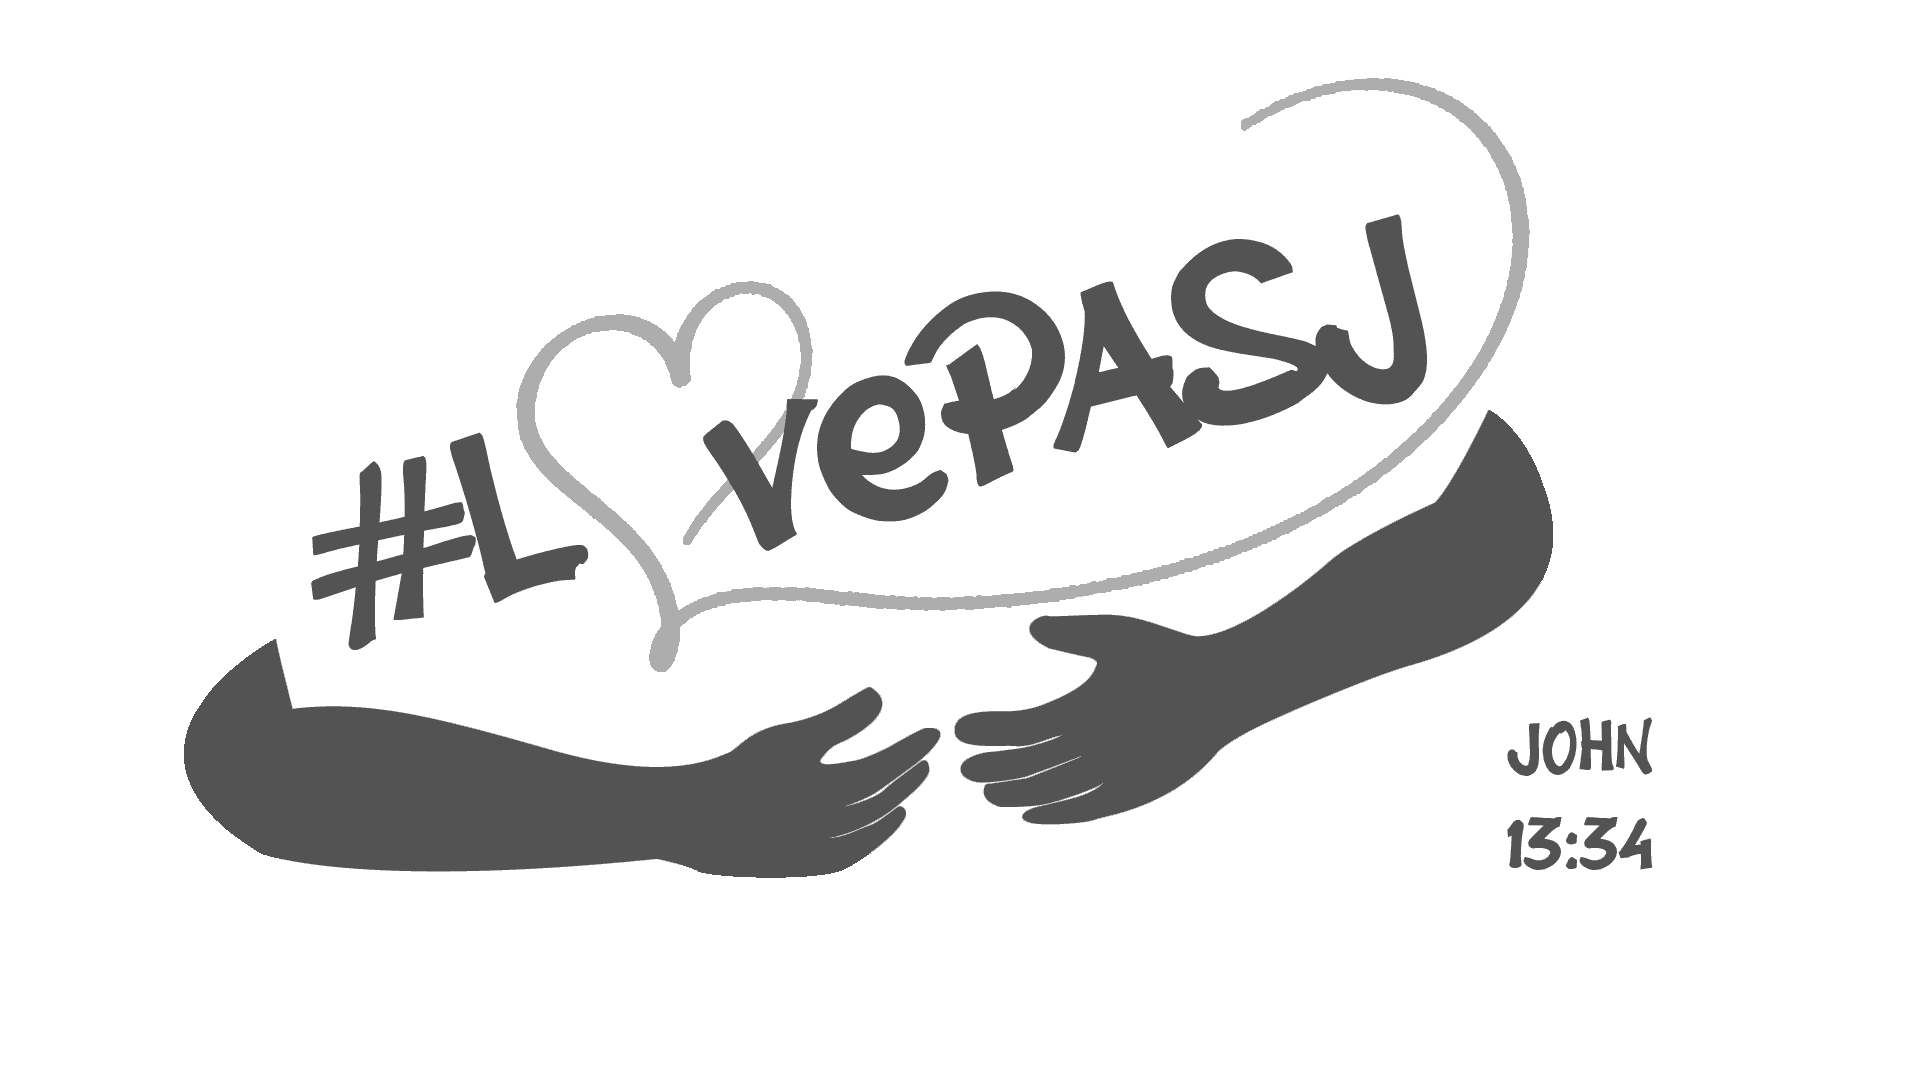 LovePASJ Logo (white-gray)